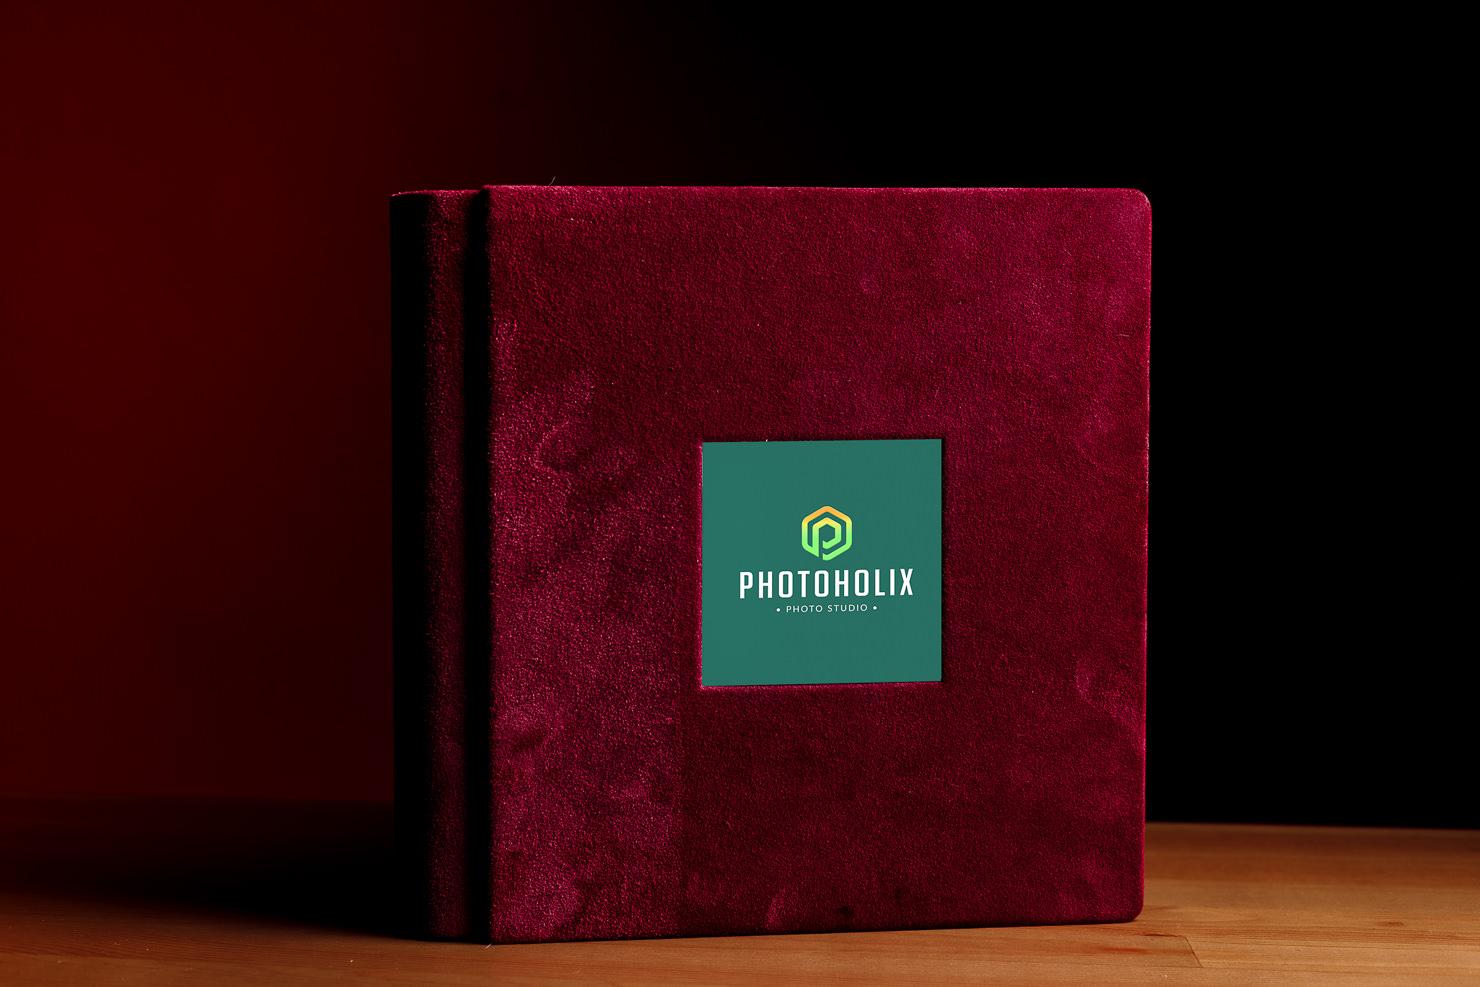 Album foto - Studio Photoholix - Fotografie maternitate, fotografie nou-nascut, fotografie copii, fotograf familie